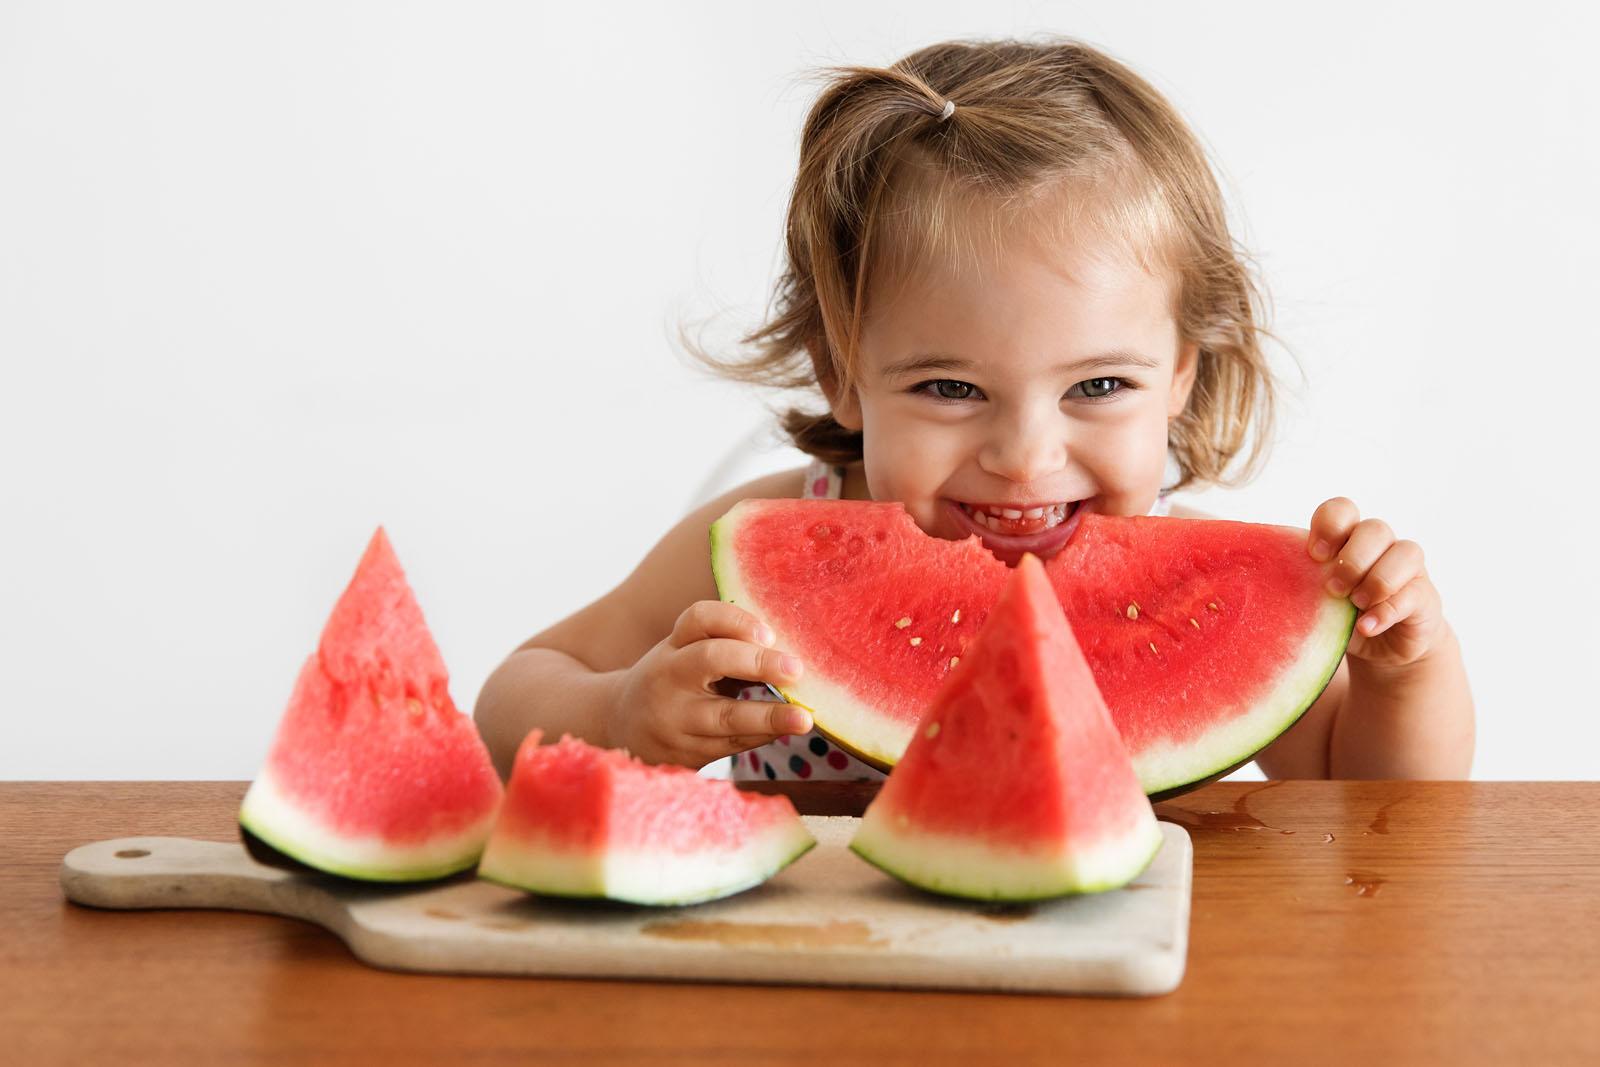 girl-eating-watermelon-lisa-tichane